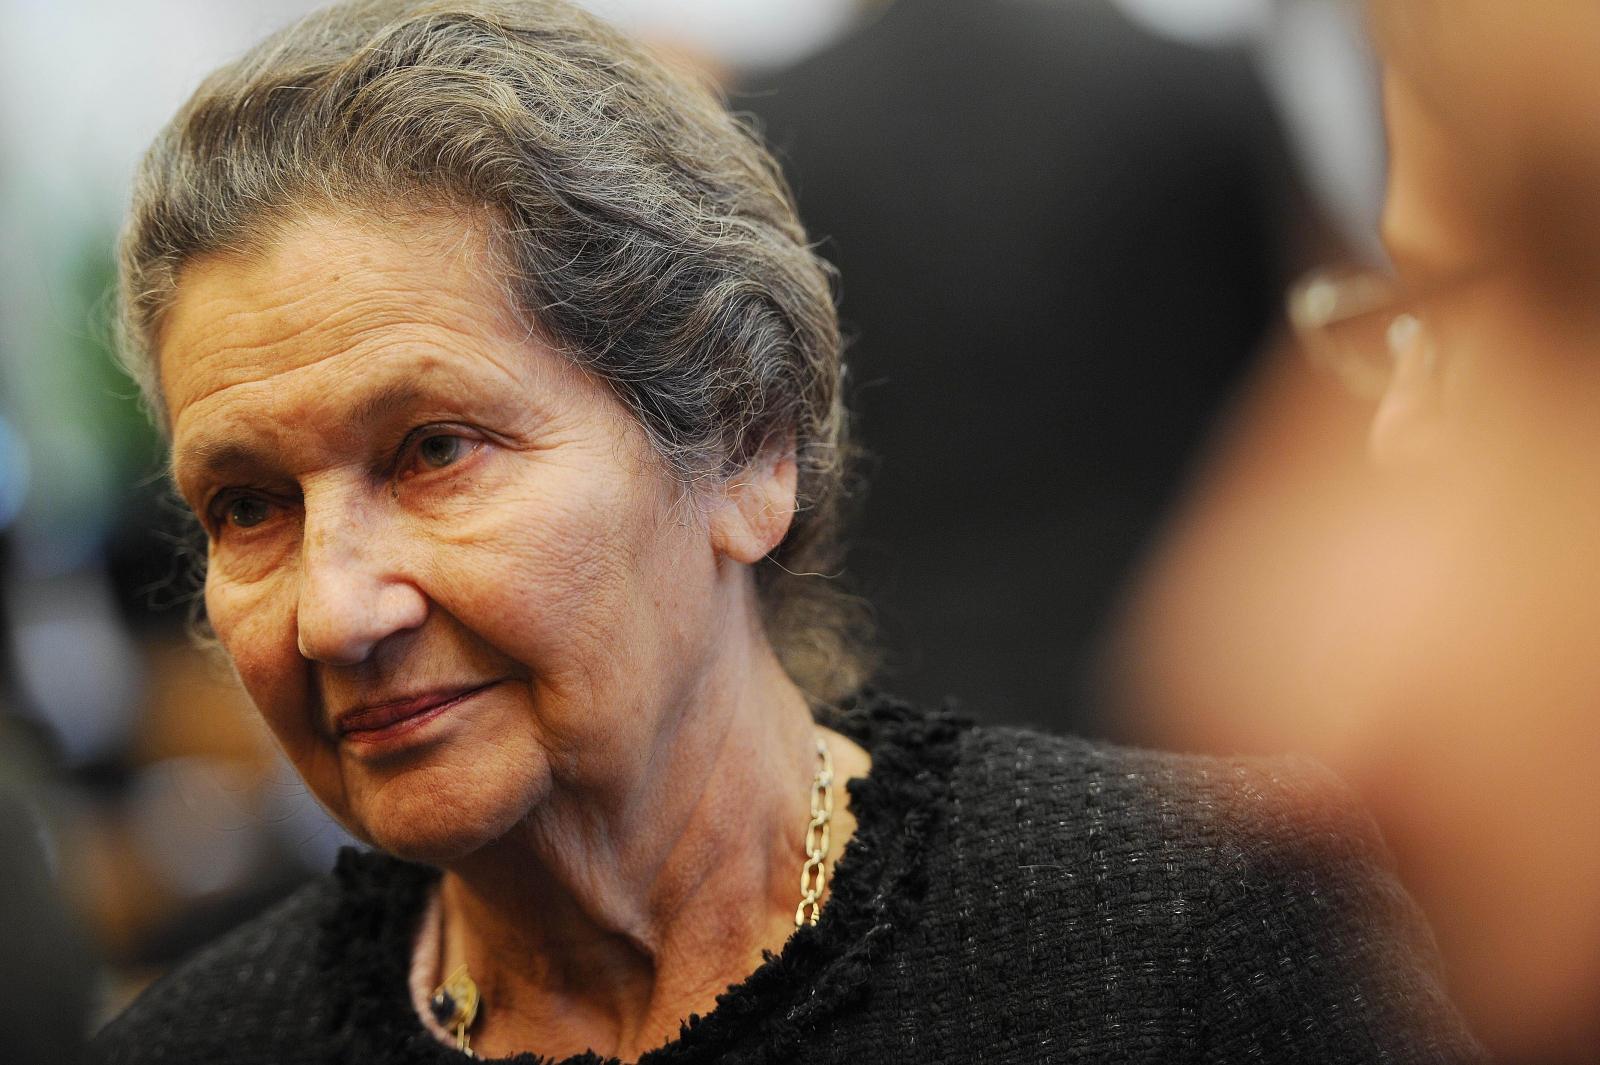 Simone Veil: French politician and Holocaust survivor dies